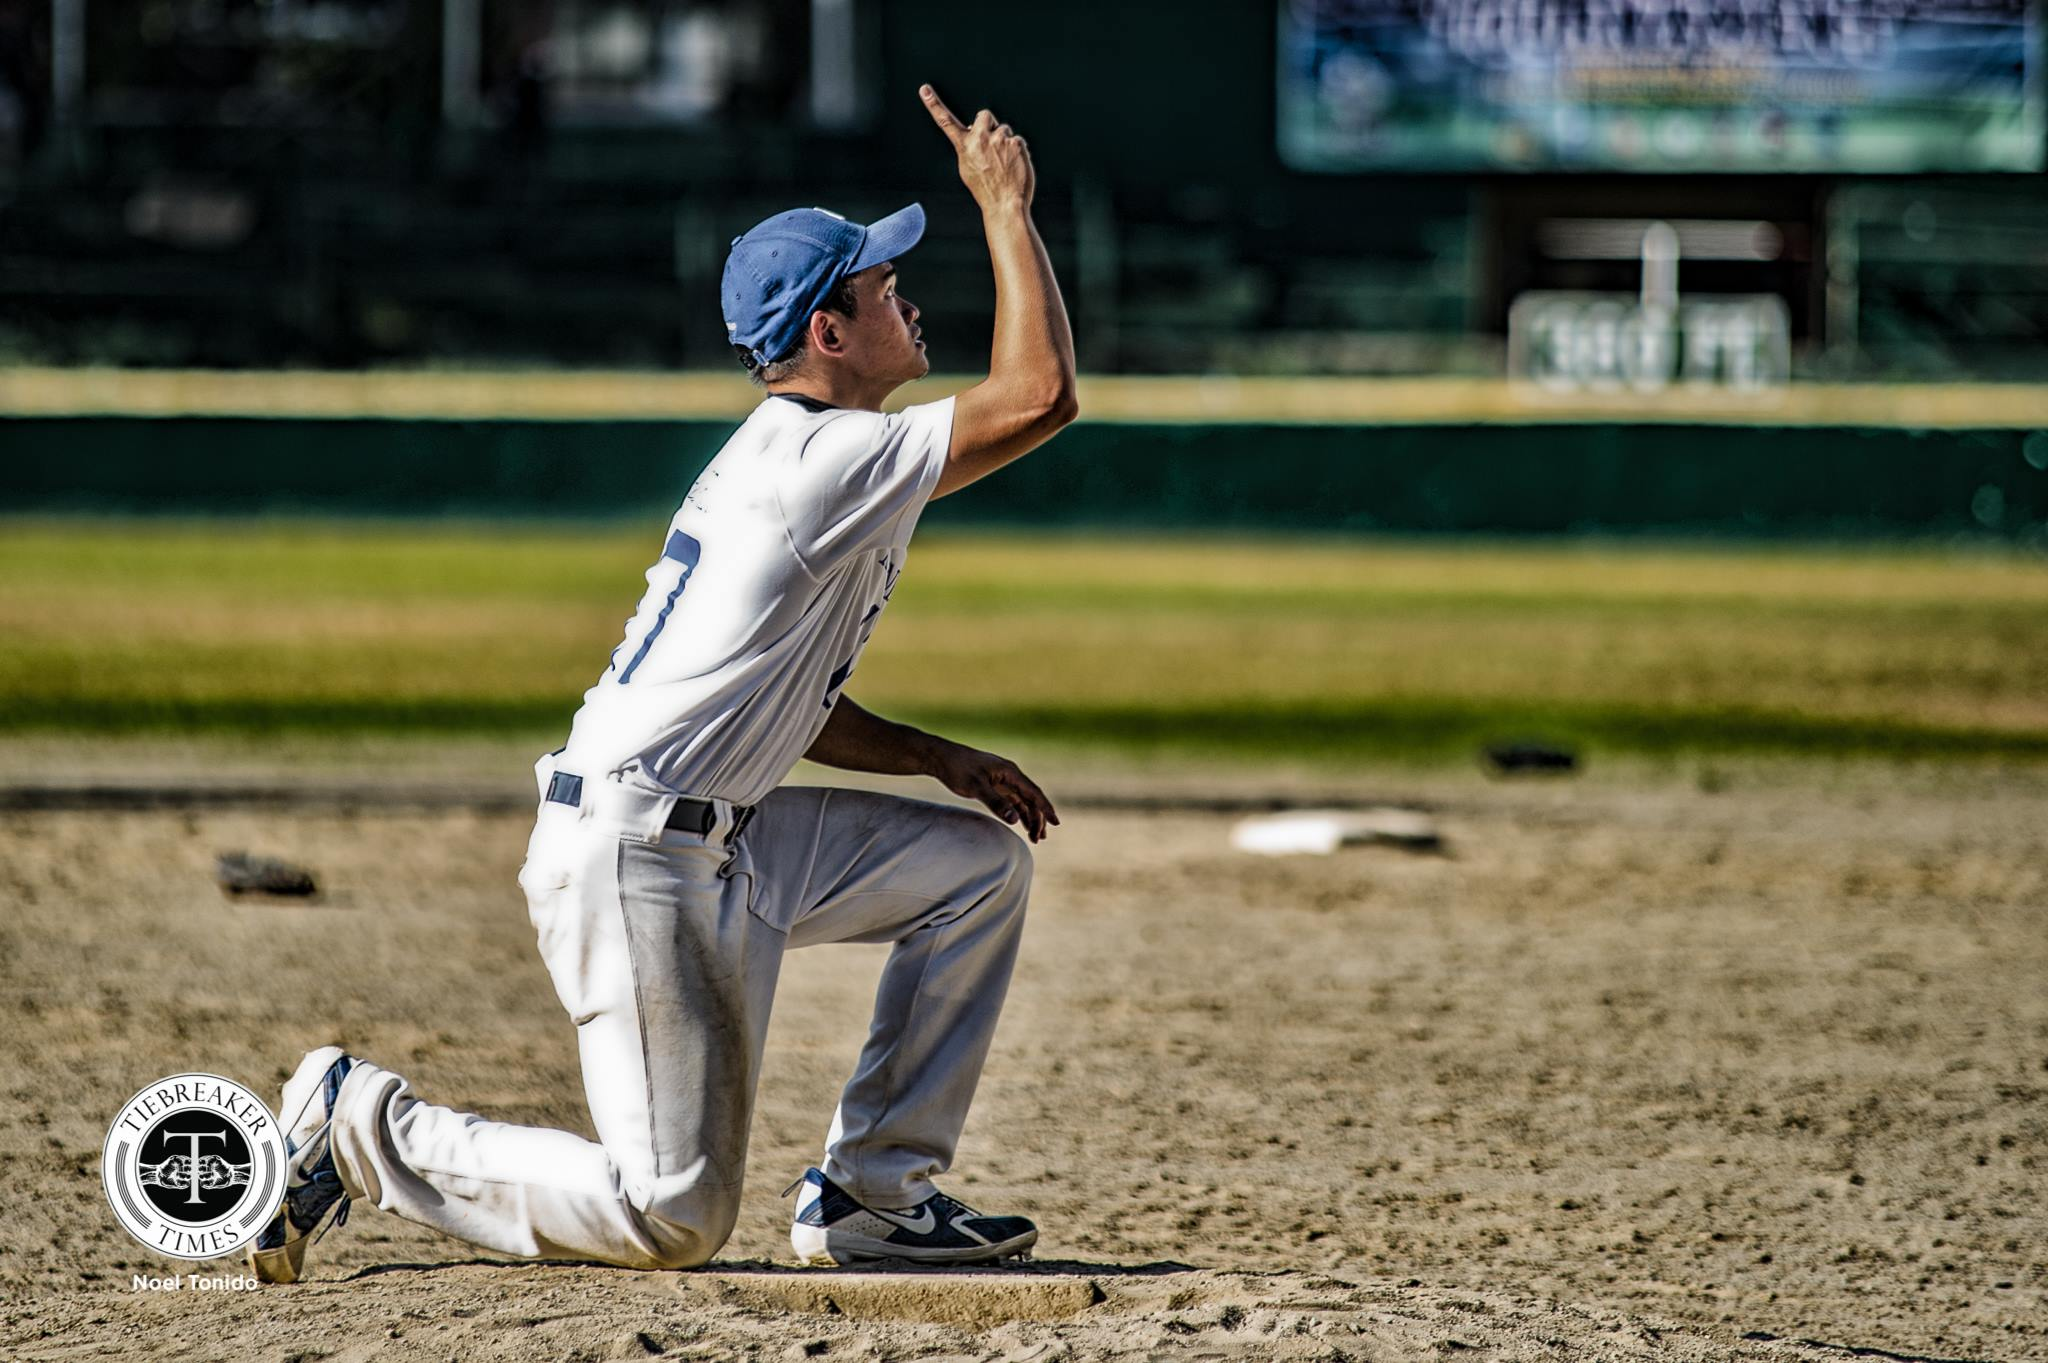 UAAP-Baseball-Finals-Game-3-DLSU-def-ADMU-Macasaet Paulo Macasaet to play for Czech team Blesk Jablonec Baseball News  - philippine sports news